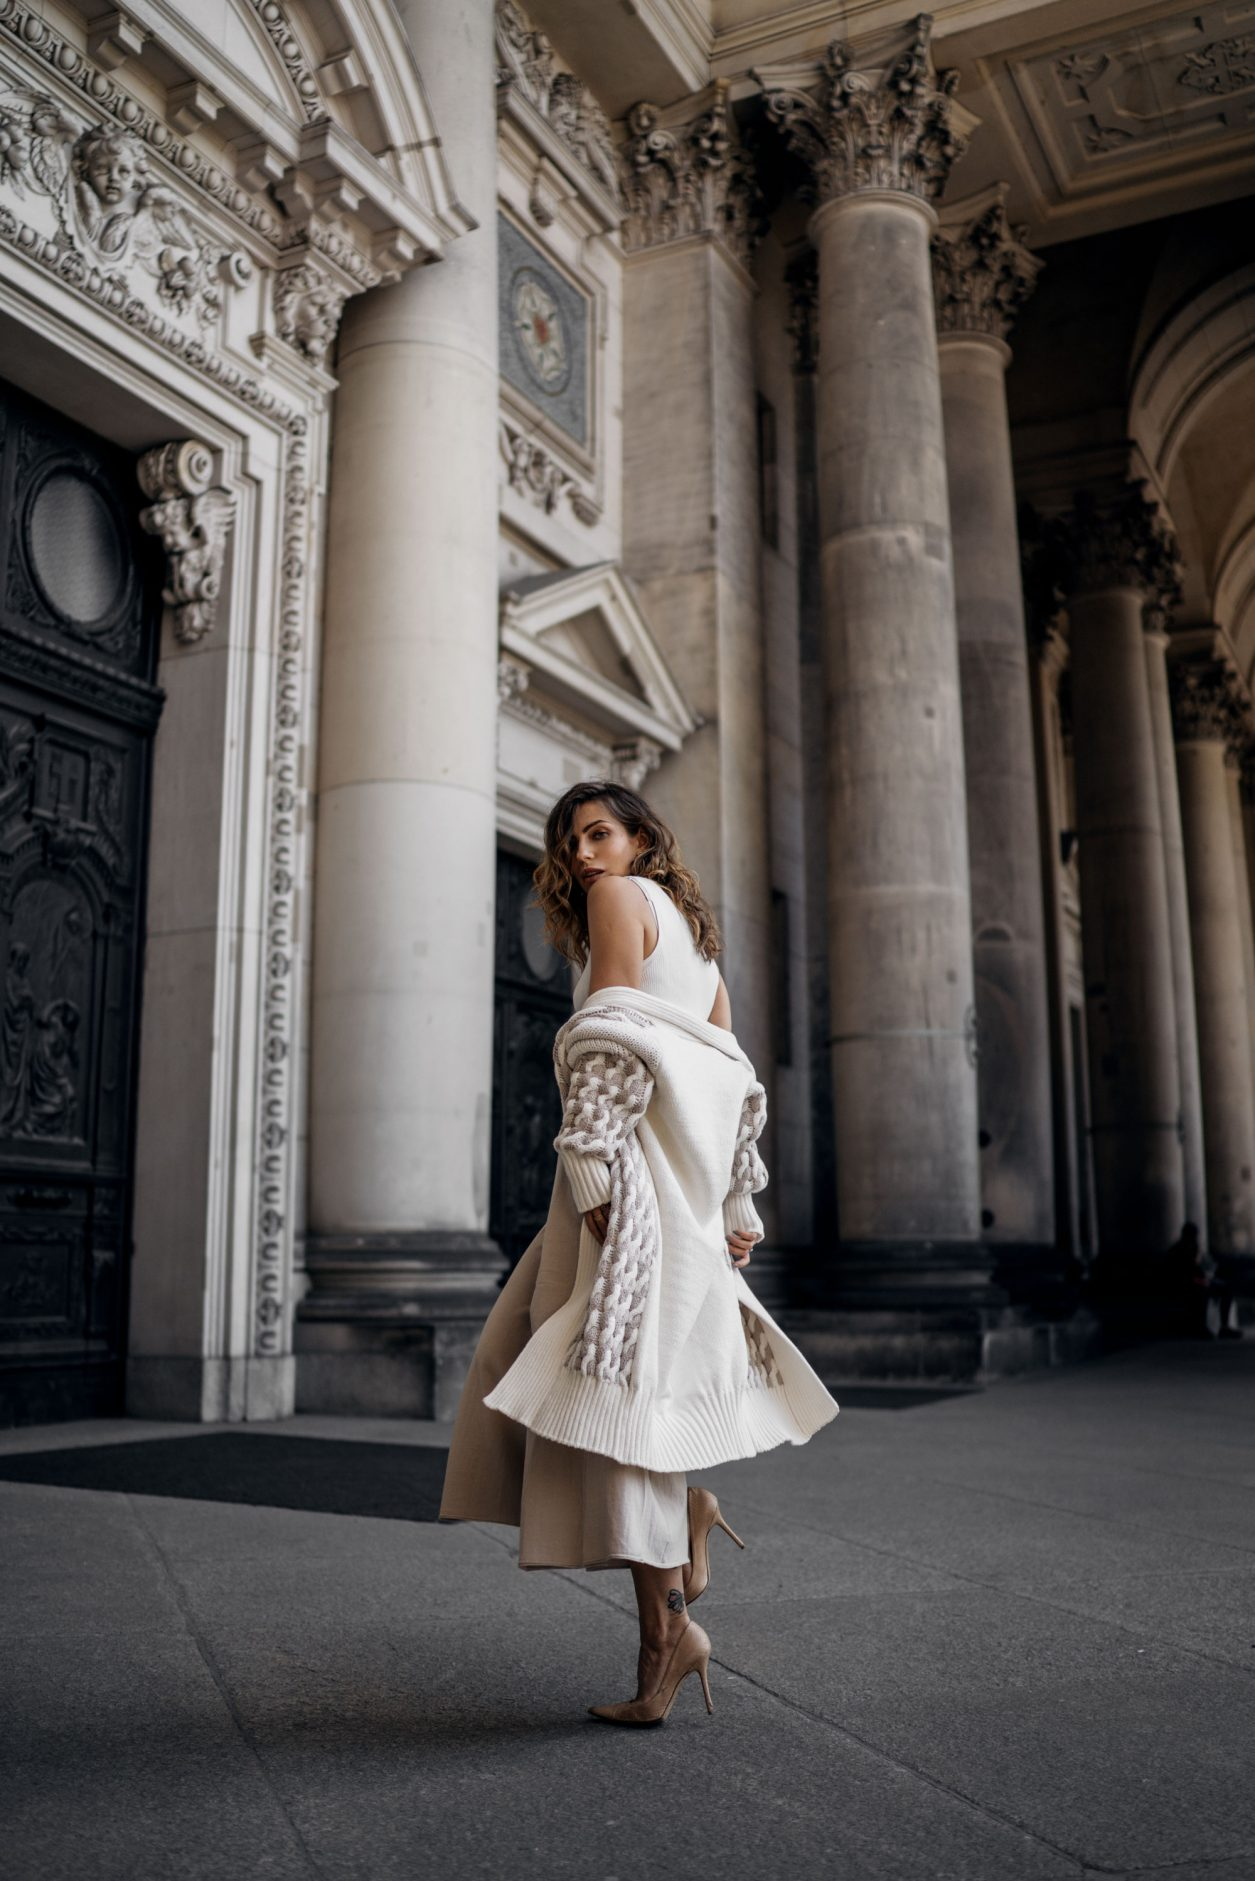 Berlin Summer Fashion Editorial |Stefanel | Masha Sedgwick | Museum Island | beige tones